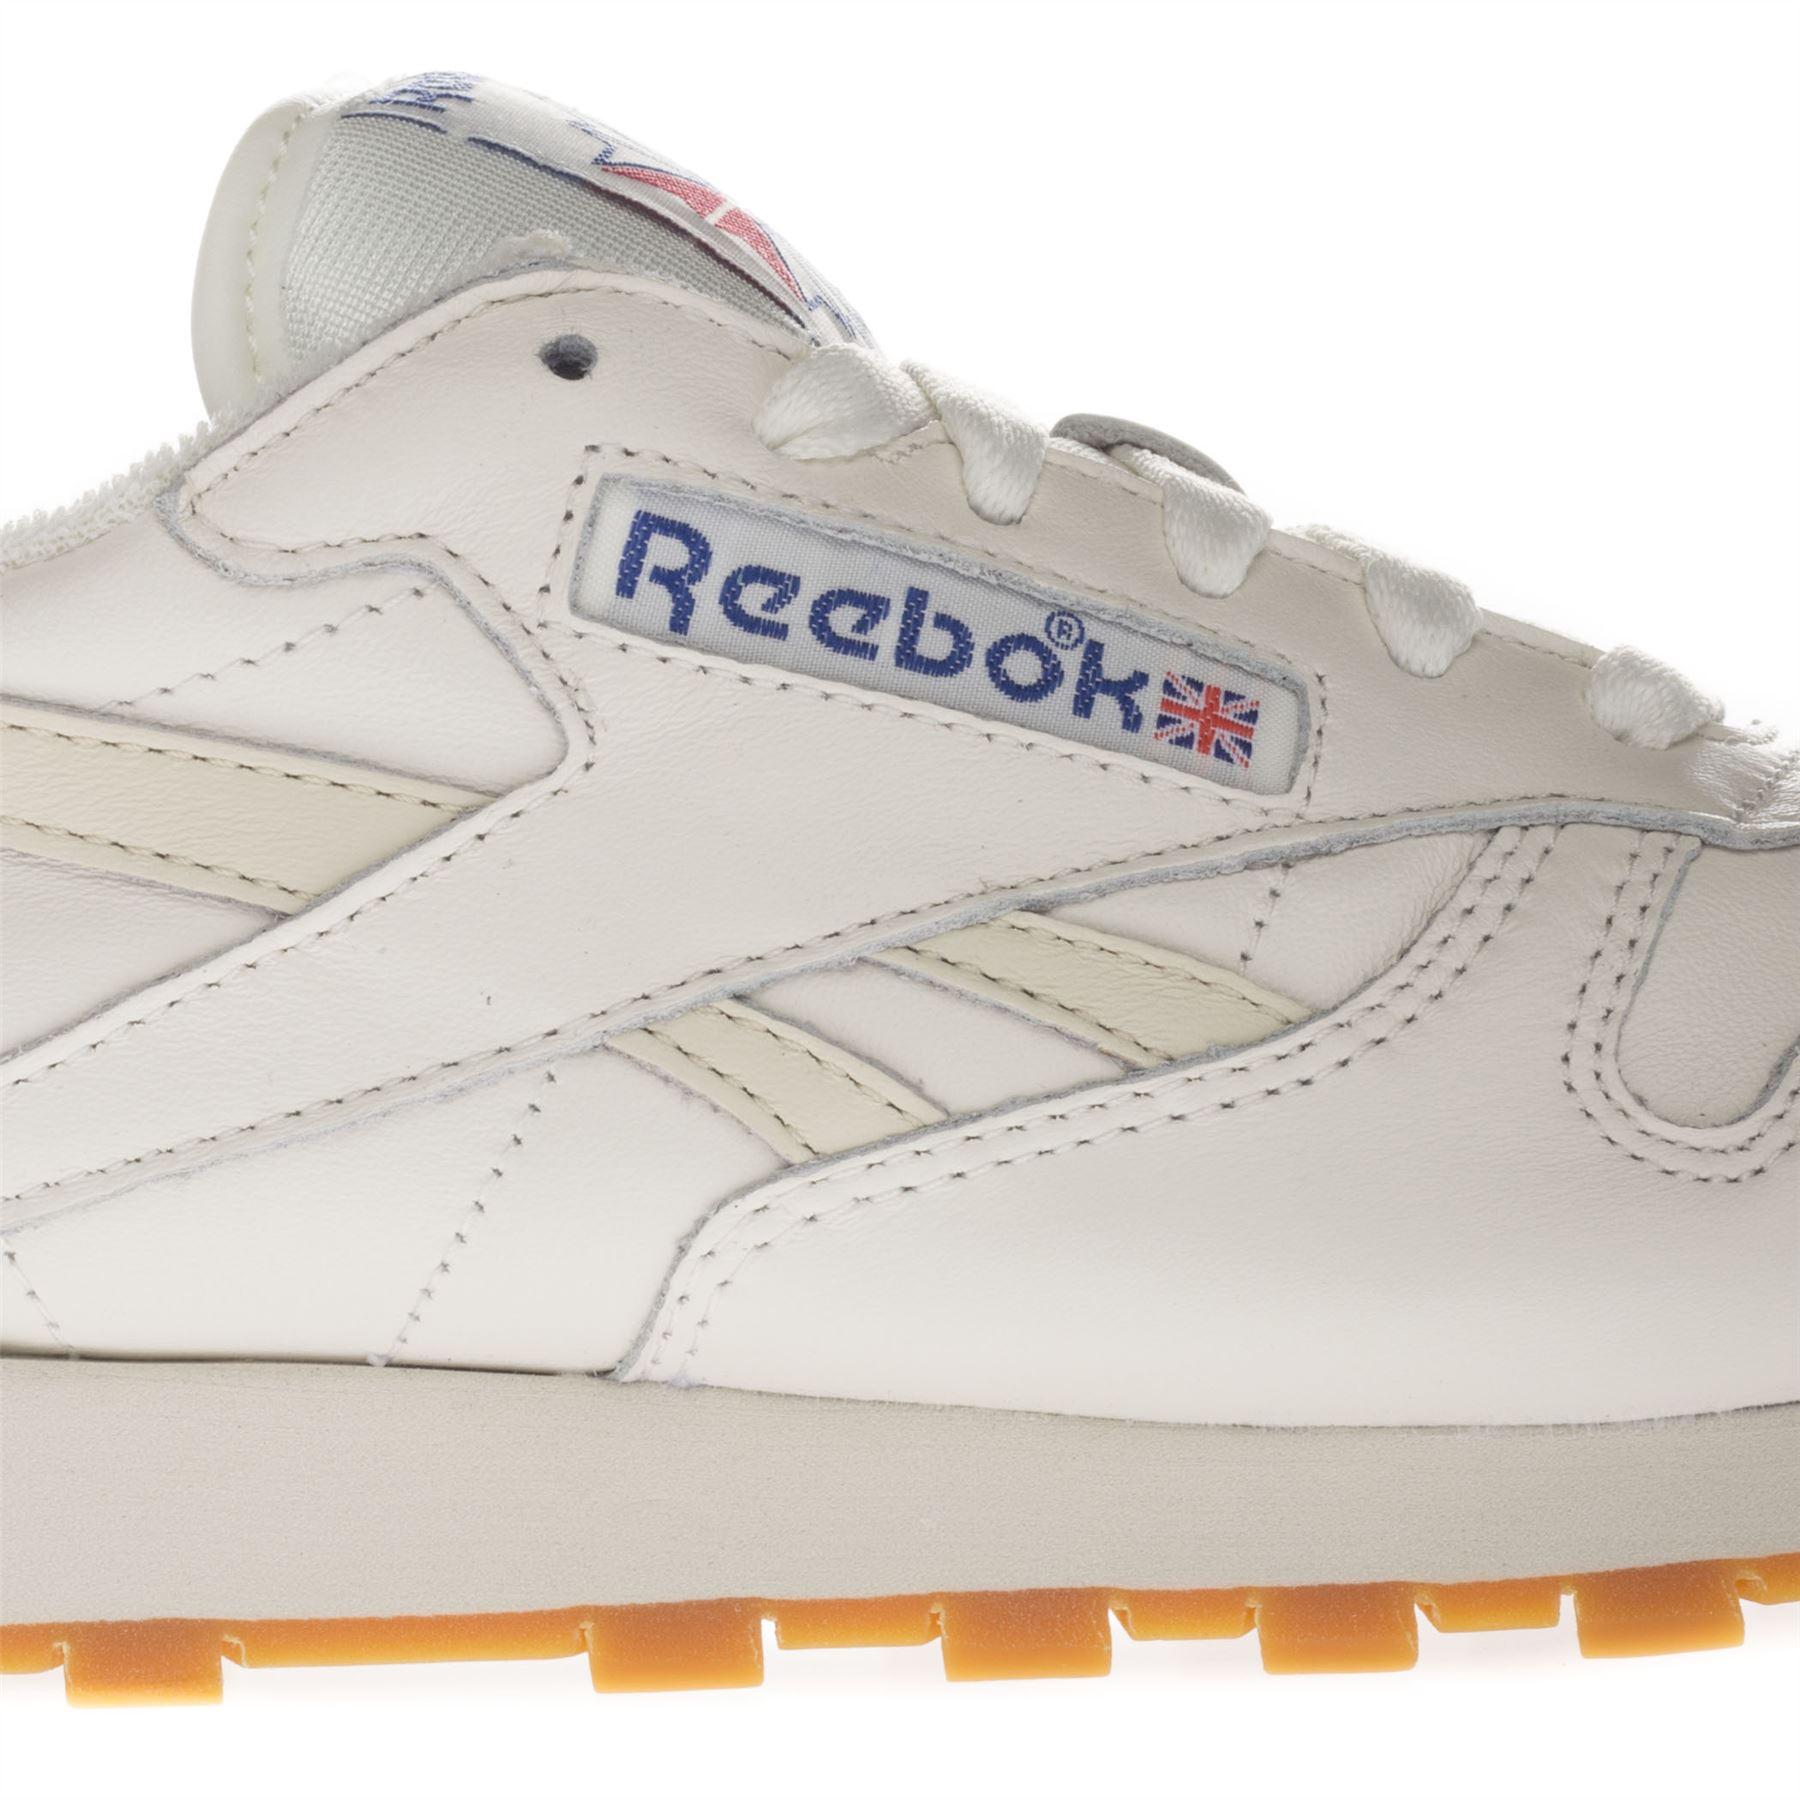 vintage reebok trainers